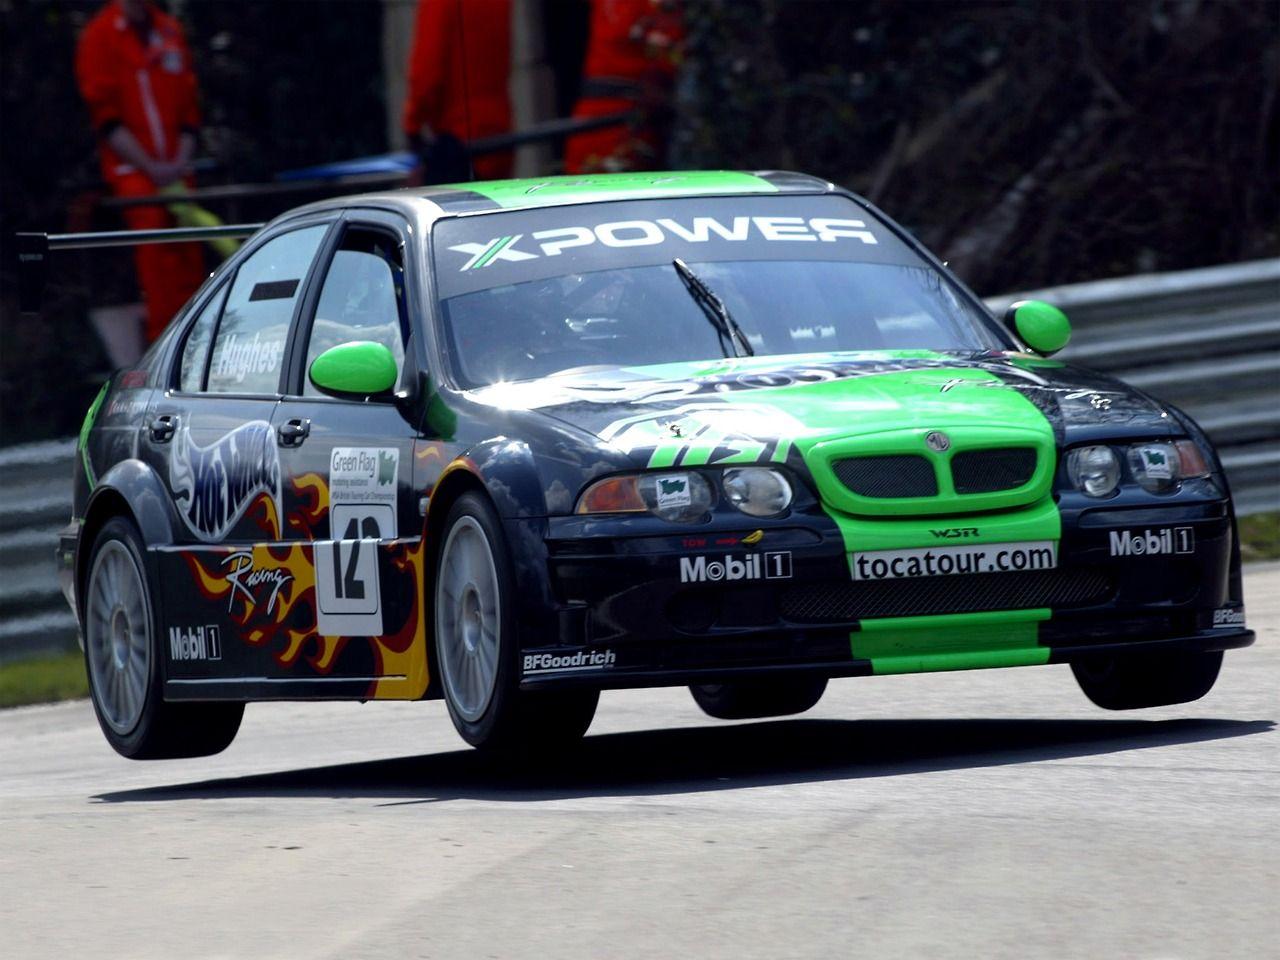 MG BTCC race car | Cars & motorcycles | Pinterest | Cars, Rally and ...